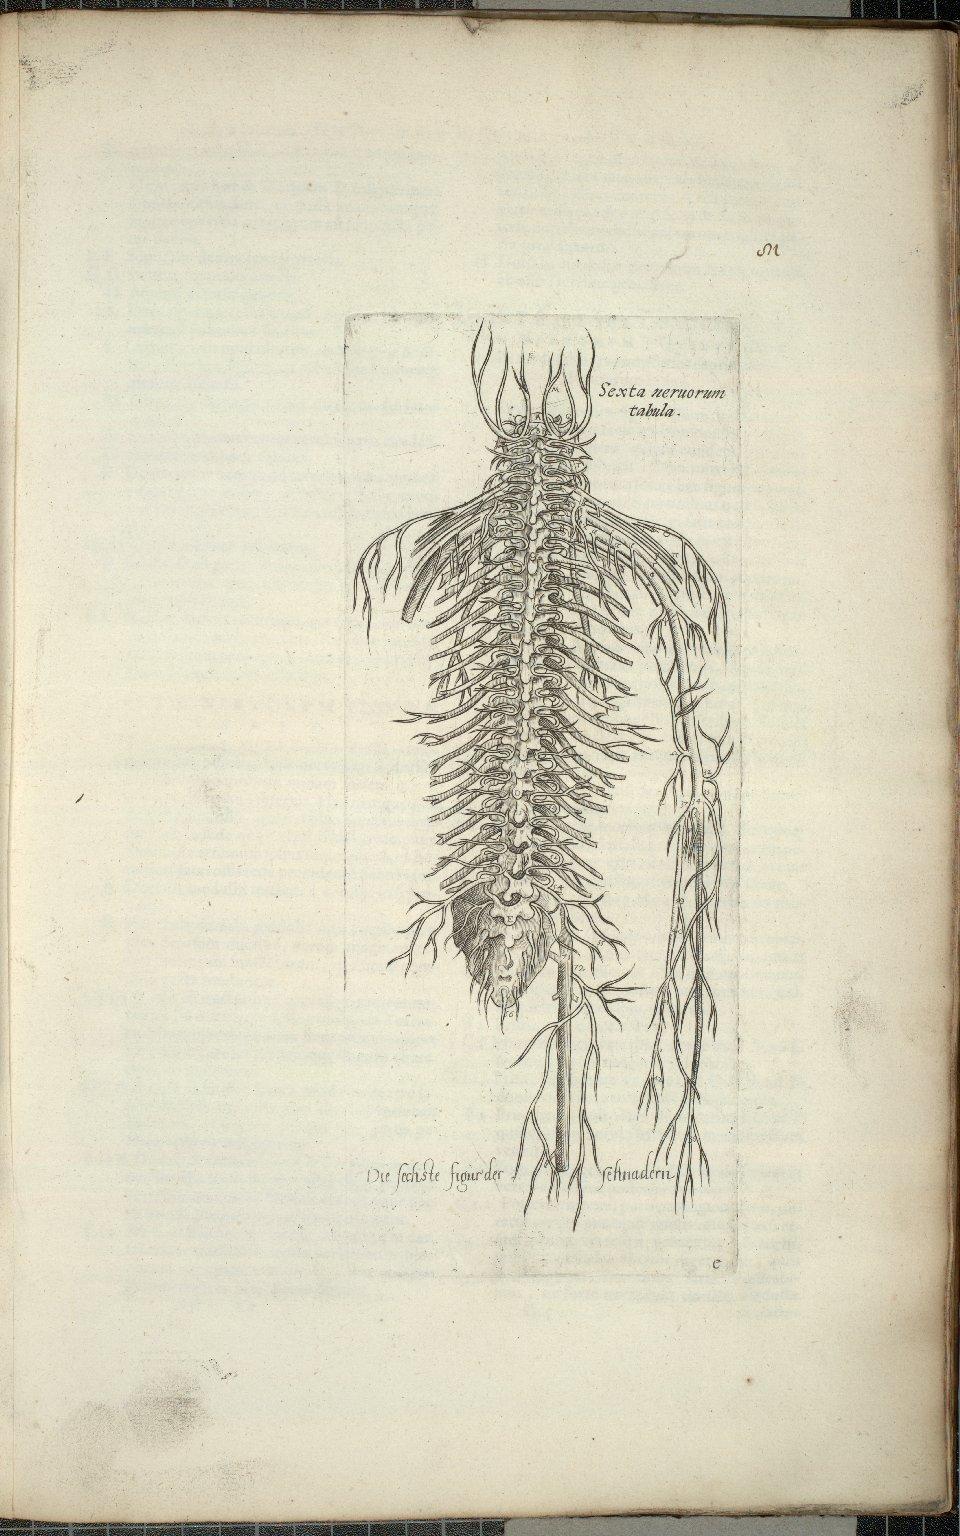 Sexta nervorum tabula